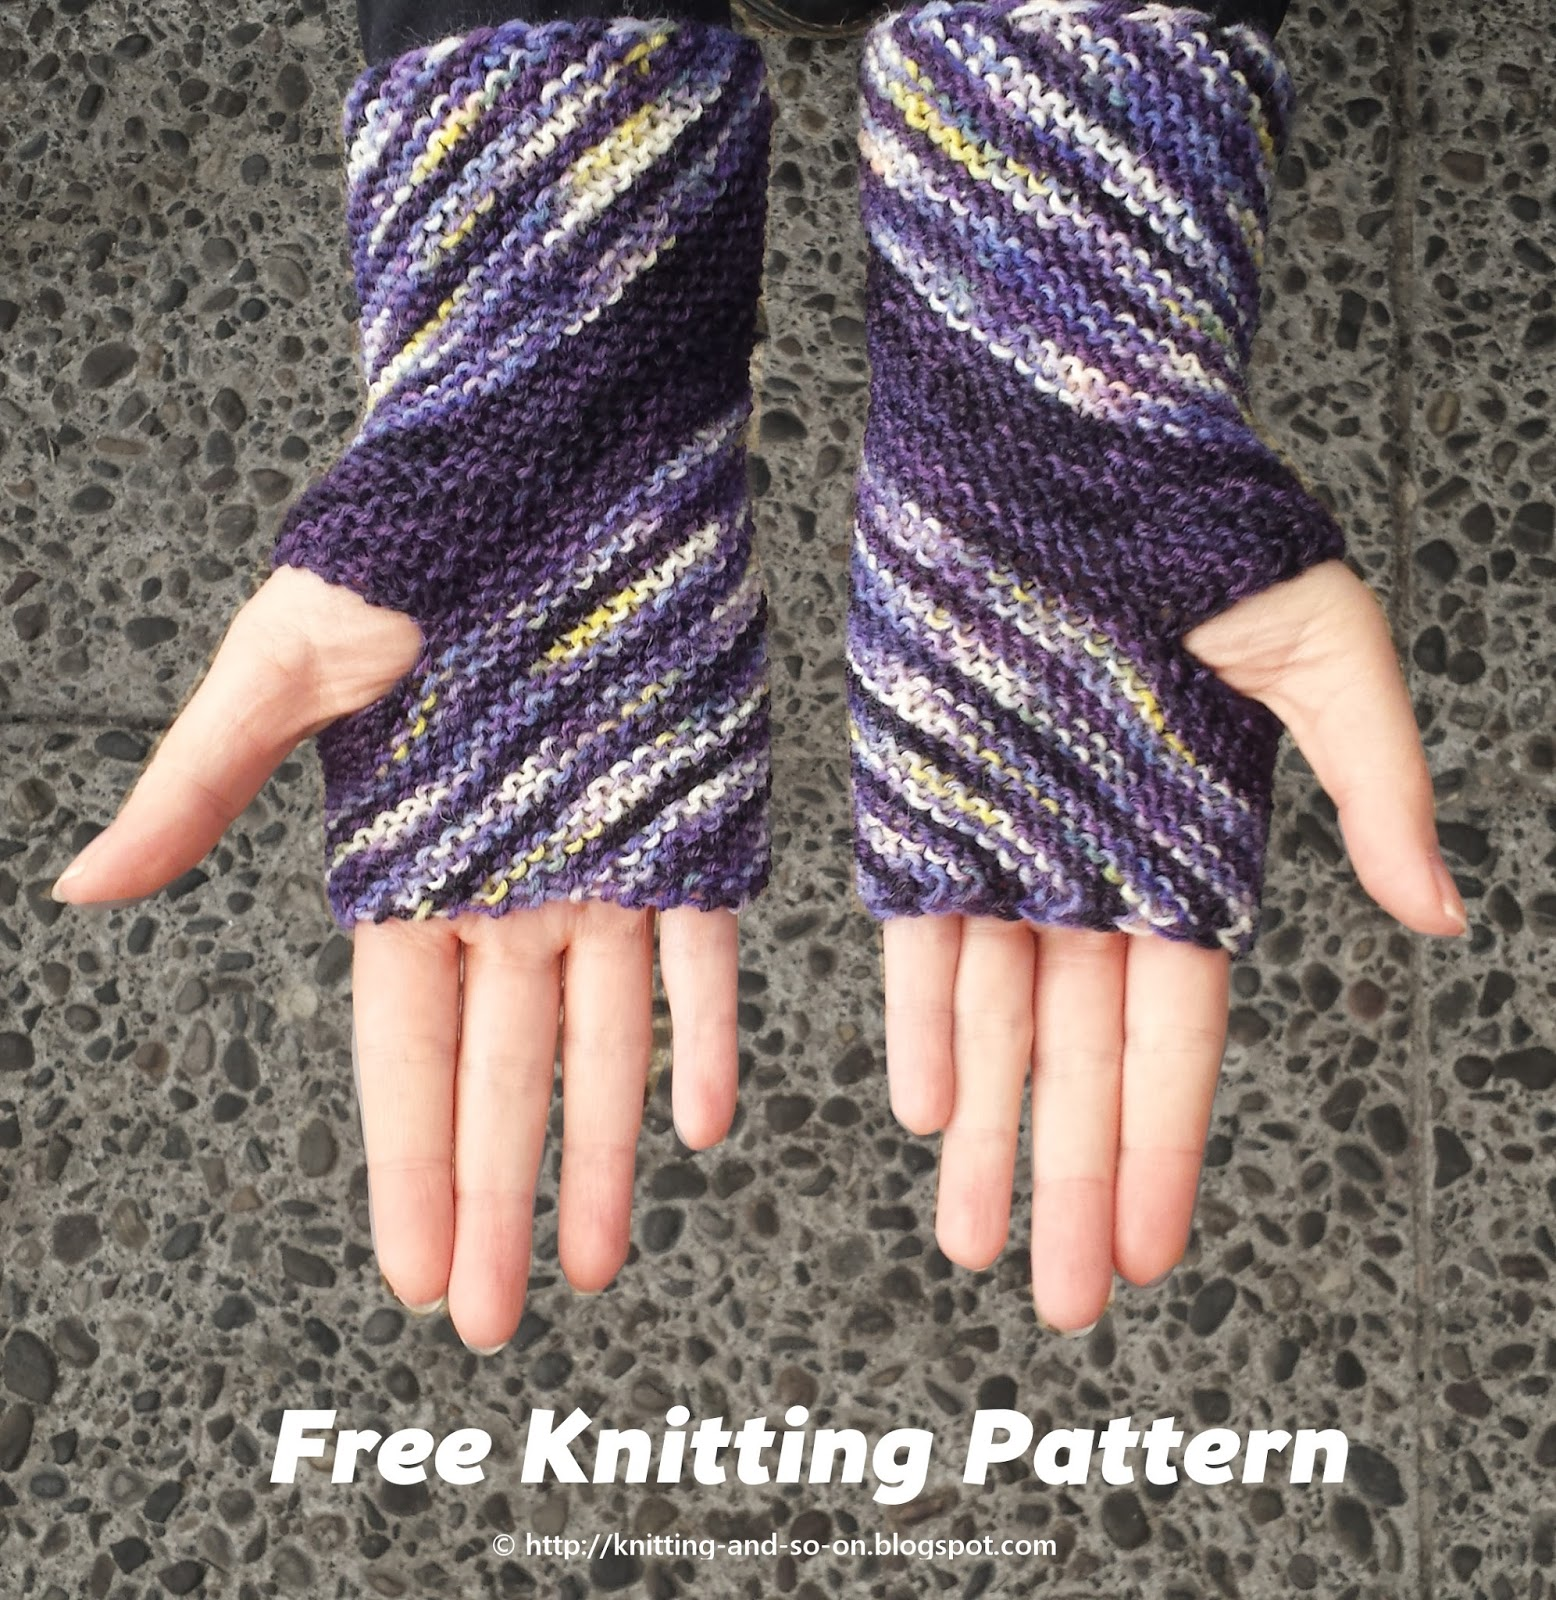 Knitting Pattern Free Wrist Warmers : Knitting and so on: Inclination Wrist Warmers